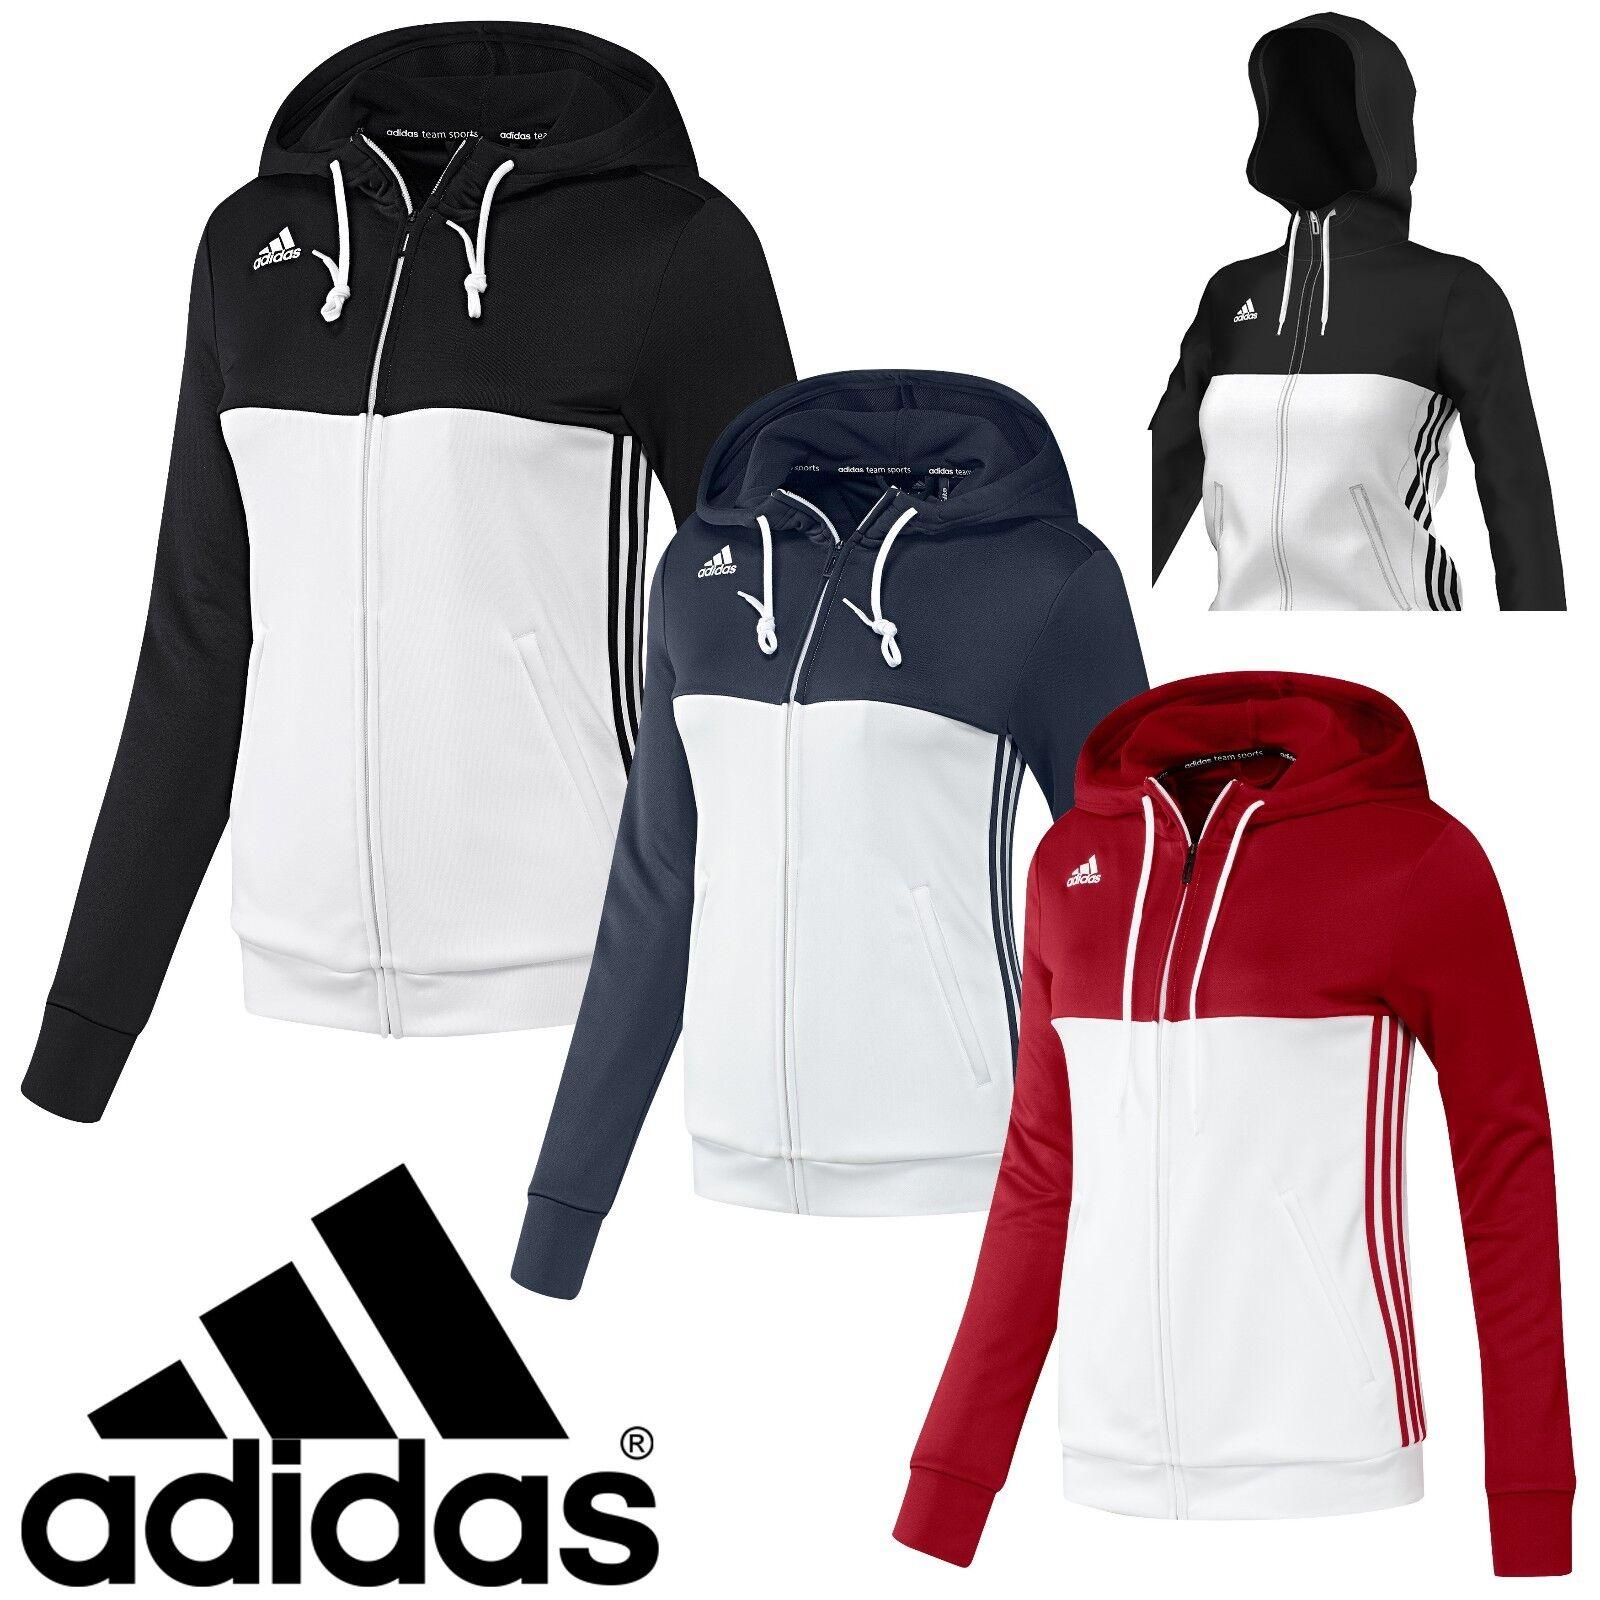 a726b6086279 adidas Ladies T16 Climalite Hoodies Womens Sports Full Zip Hooded Jacket